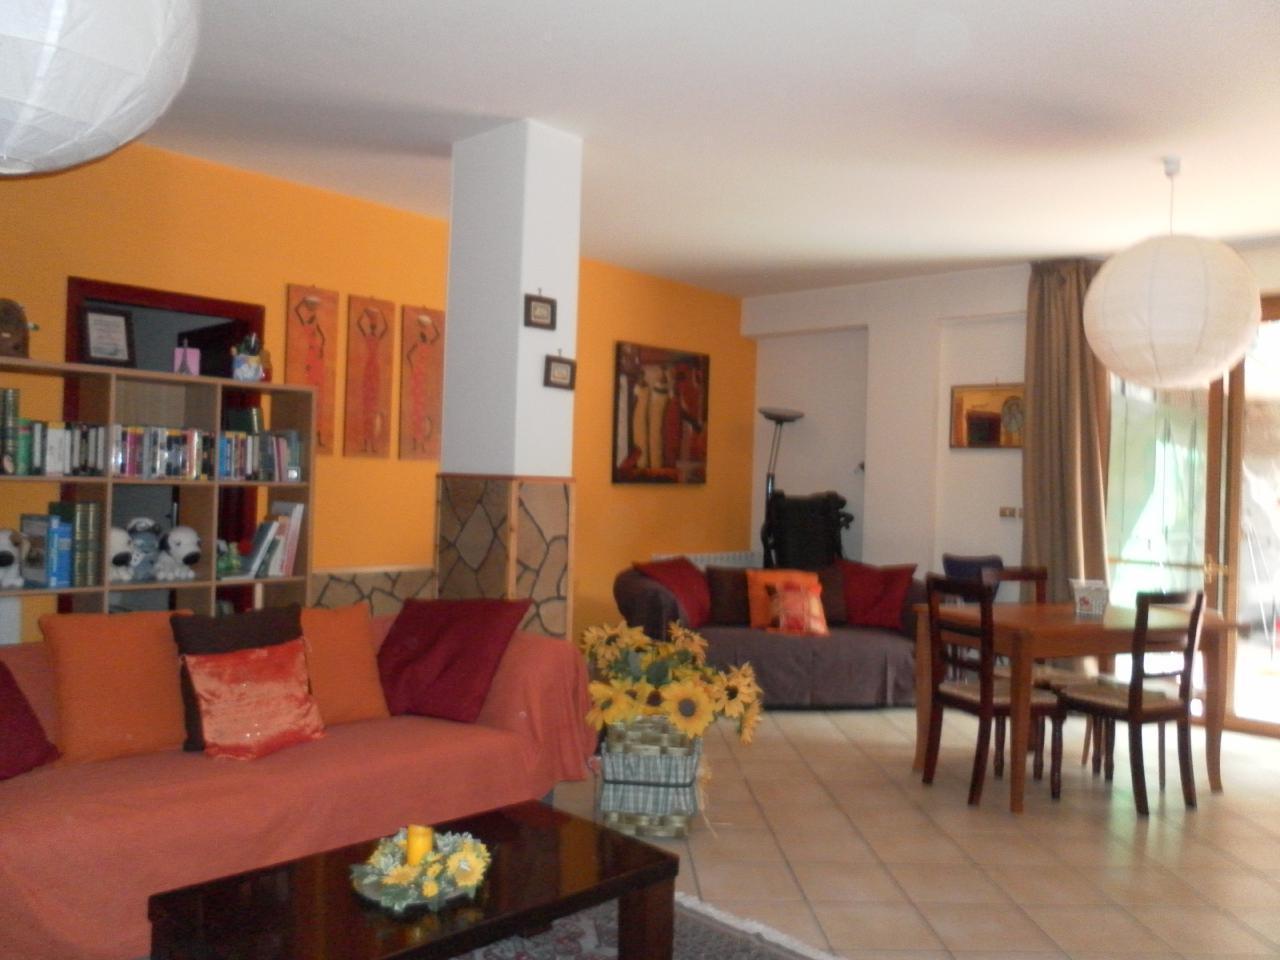 Appartement de vacances ZUHAUSE VON EMILIA - zwischen Ätna und Taormina (1743739), Aci Sant'Antonio, Catania, Sicile, Italie, image 5